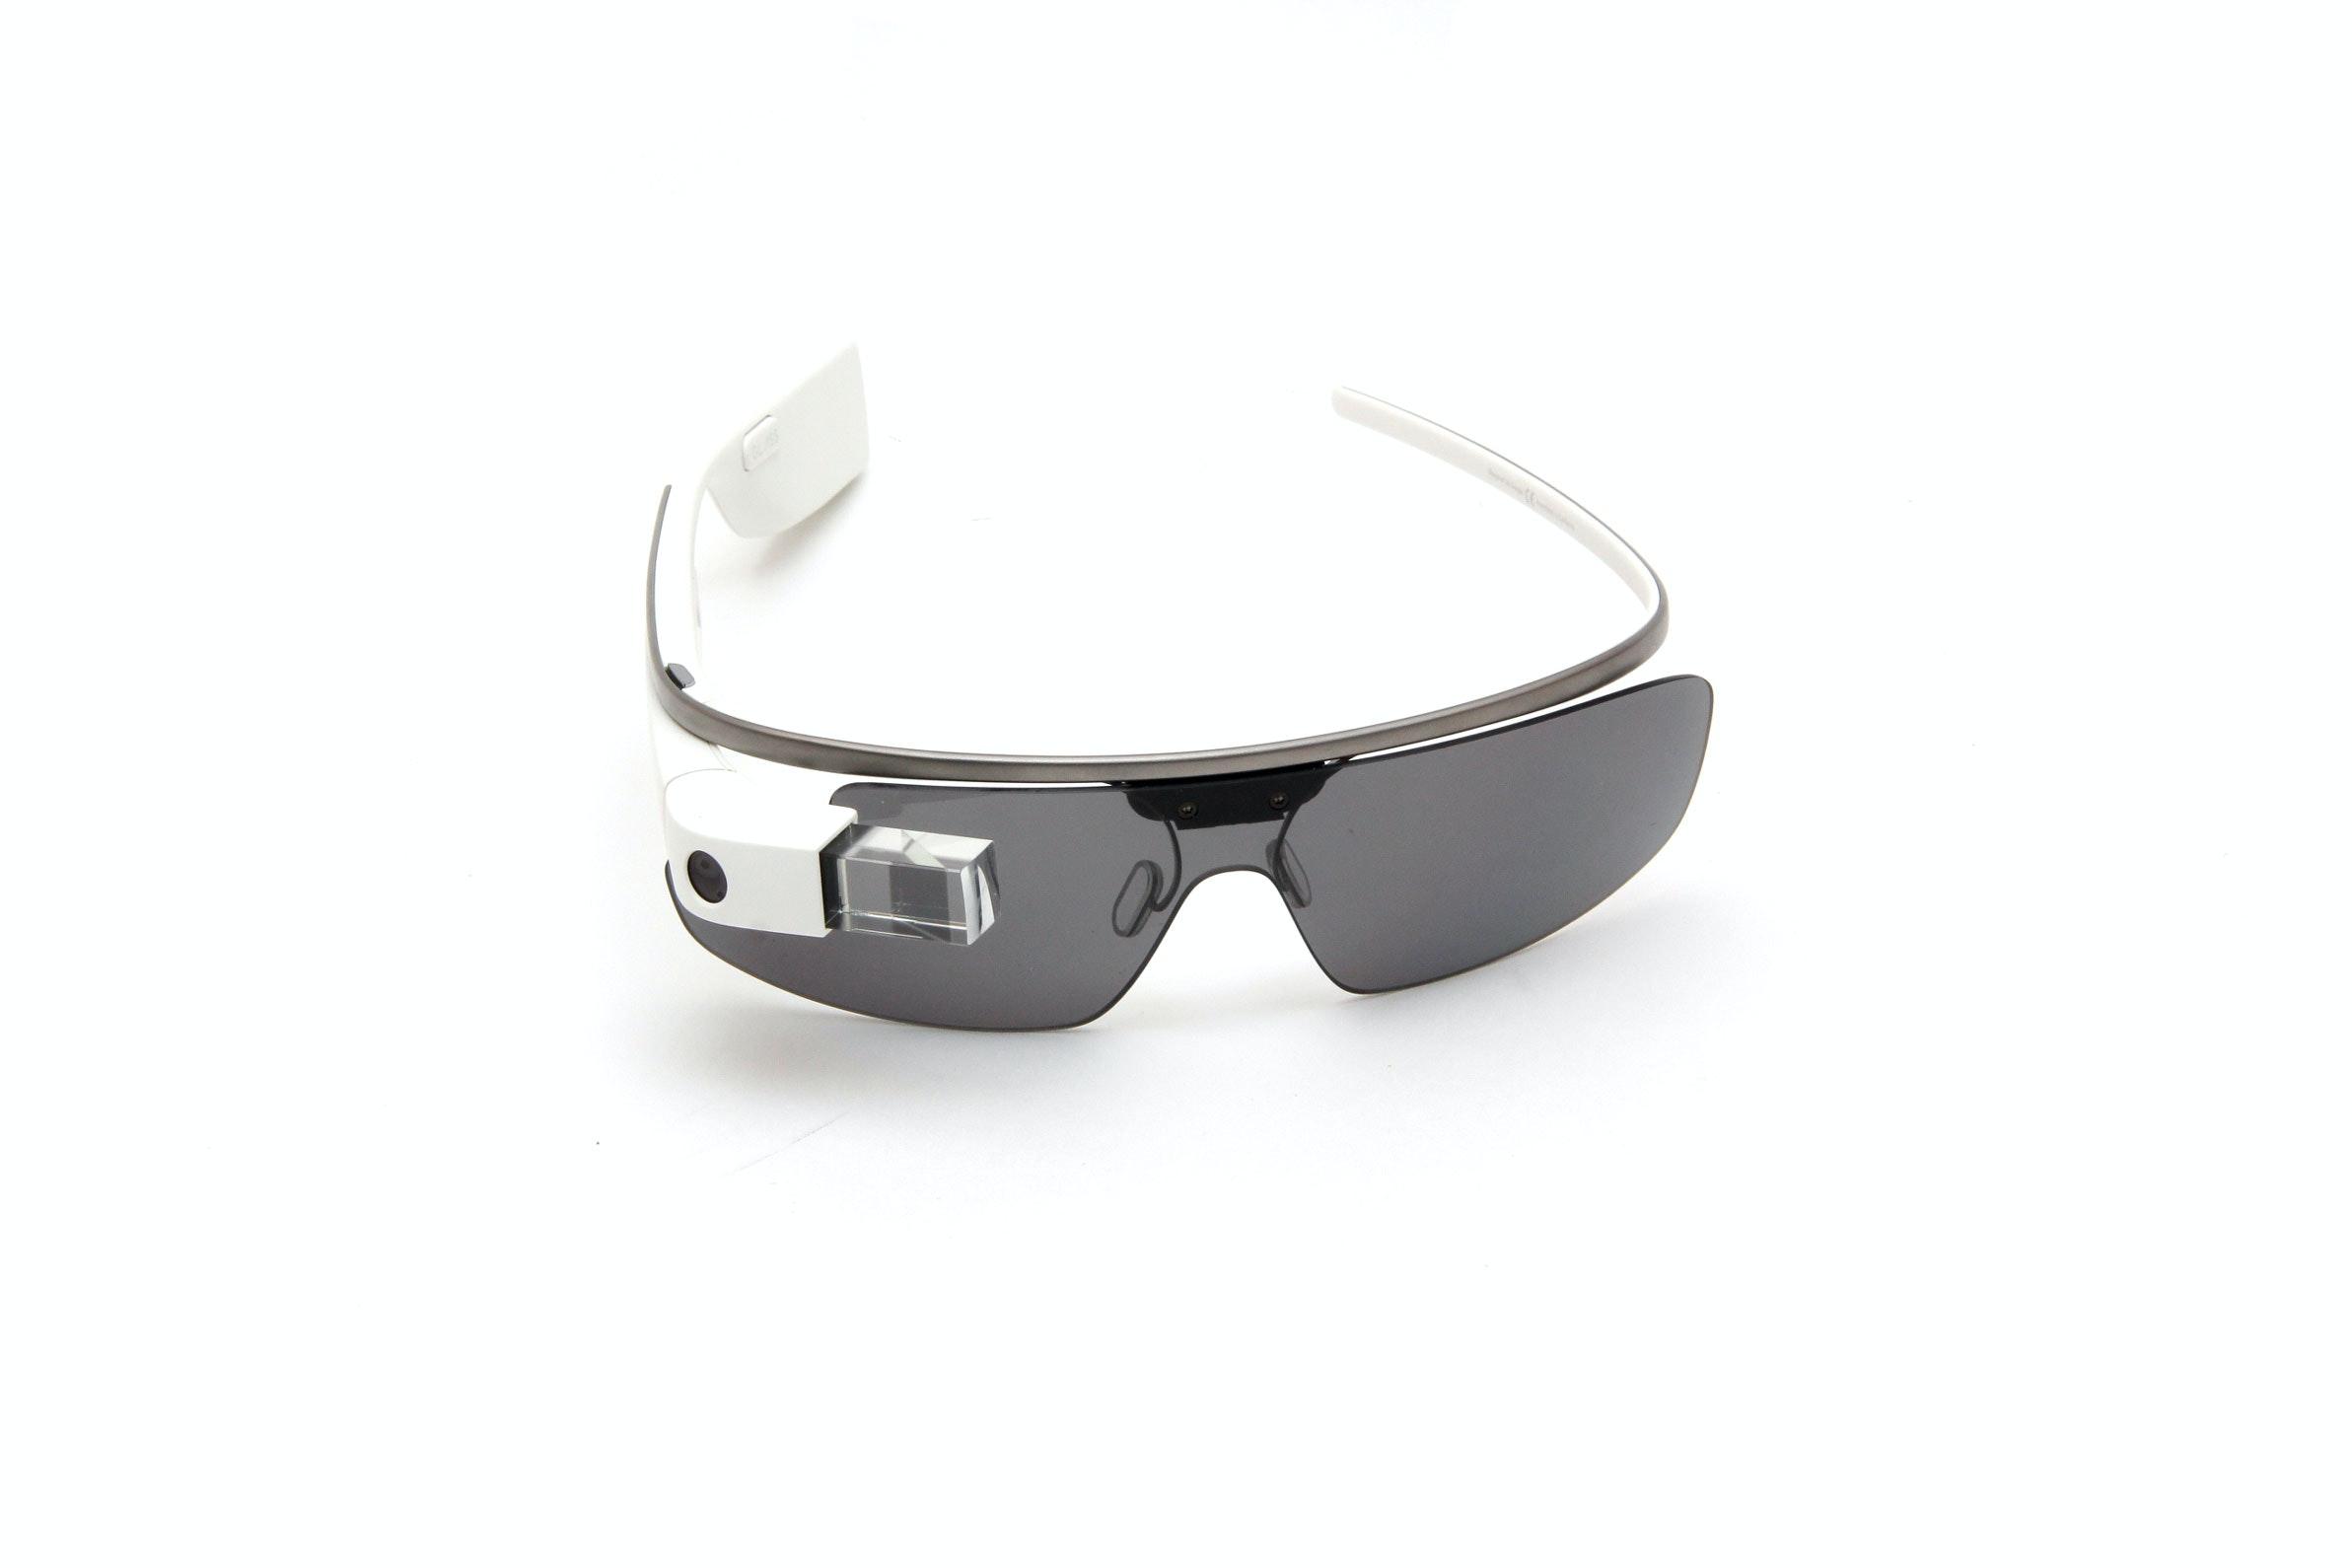 Google Glass Explorer Edition Smart Glasses